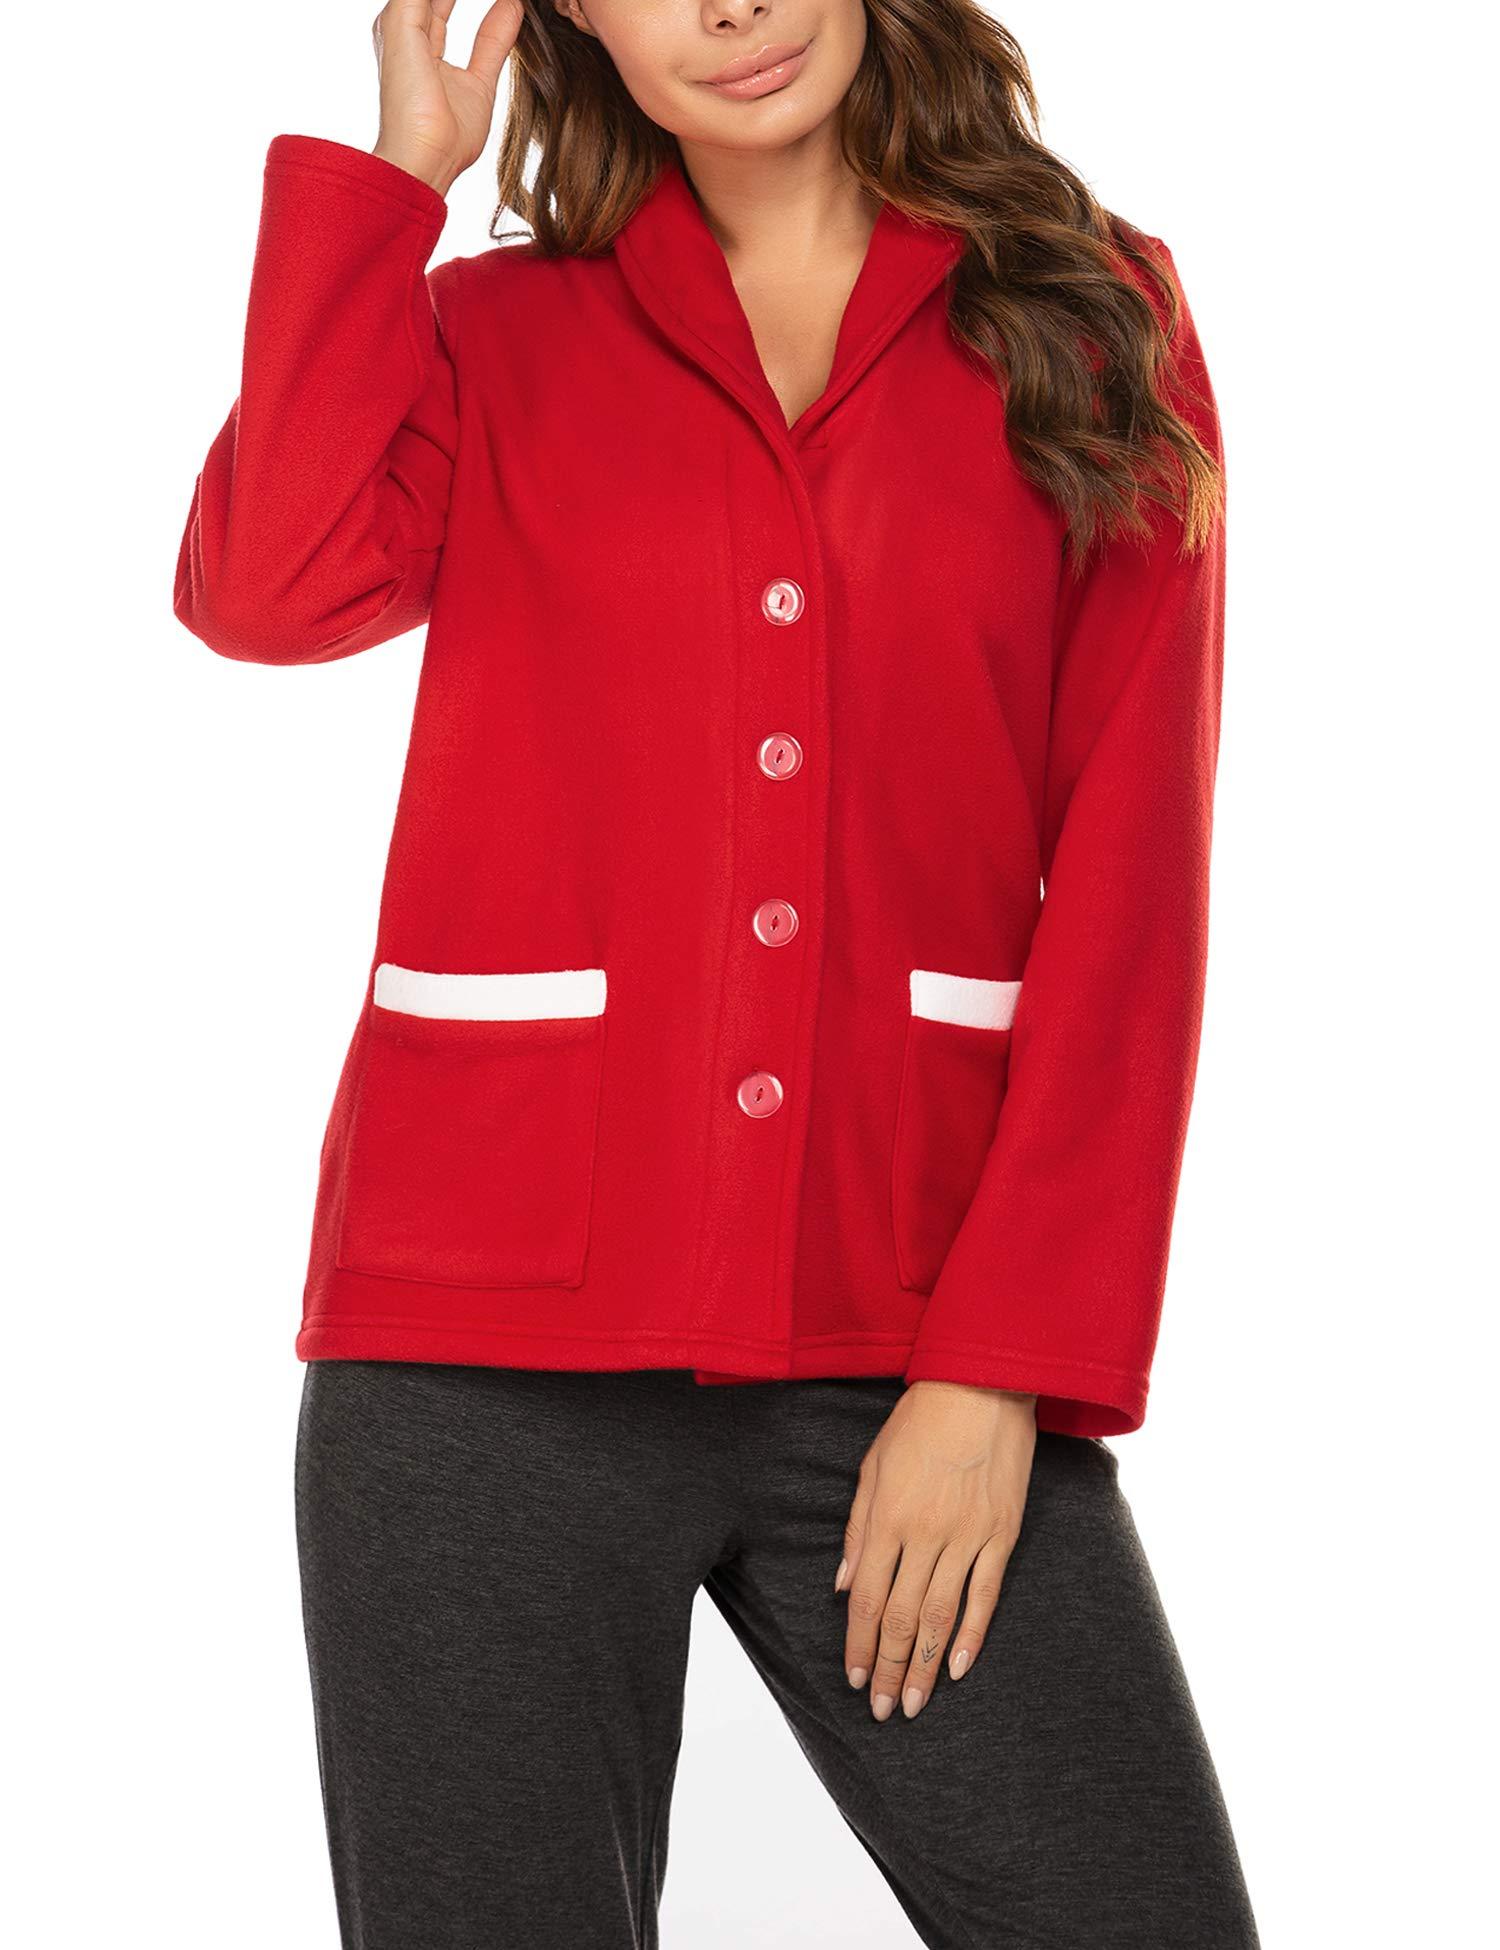 Ekouaer Women's Bed Jacket Fleece Lightwight Shawl Collar Coat Button Sleep Robe with Pockets